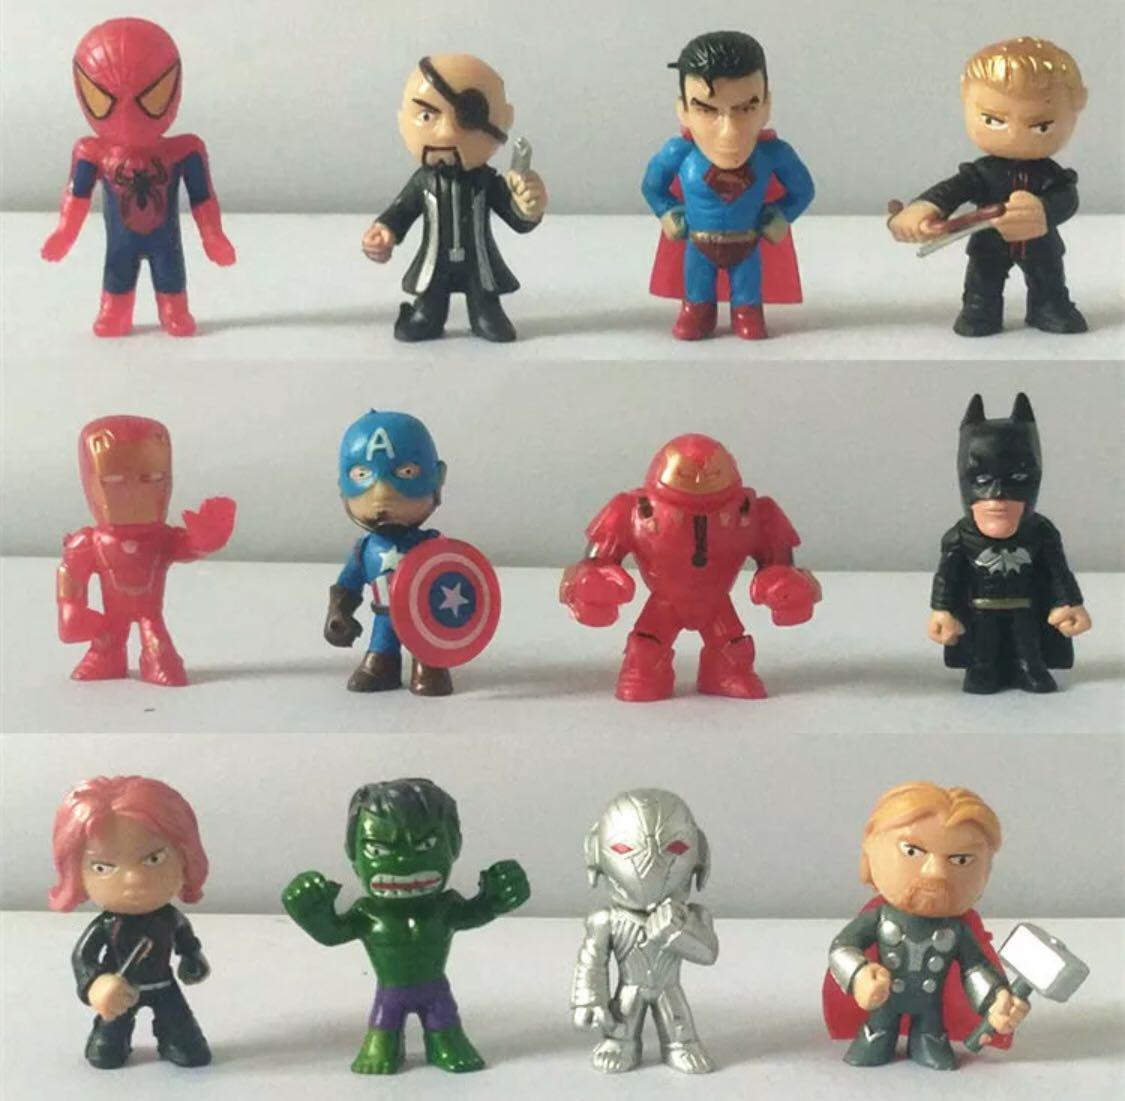 IRON MAN Avengers Cake Topper Figurine Figure Decoration Birthday Characters